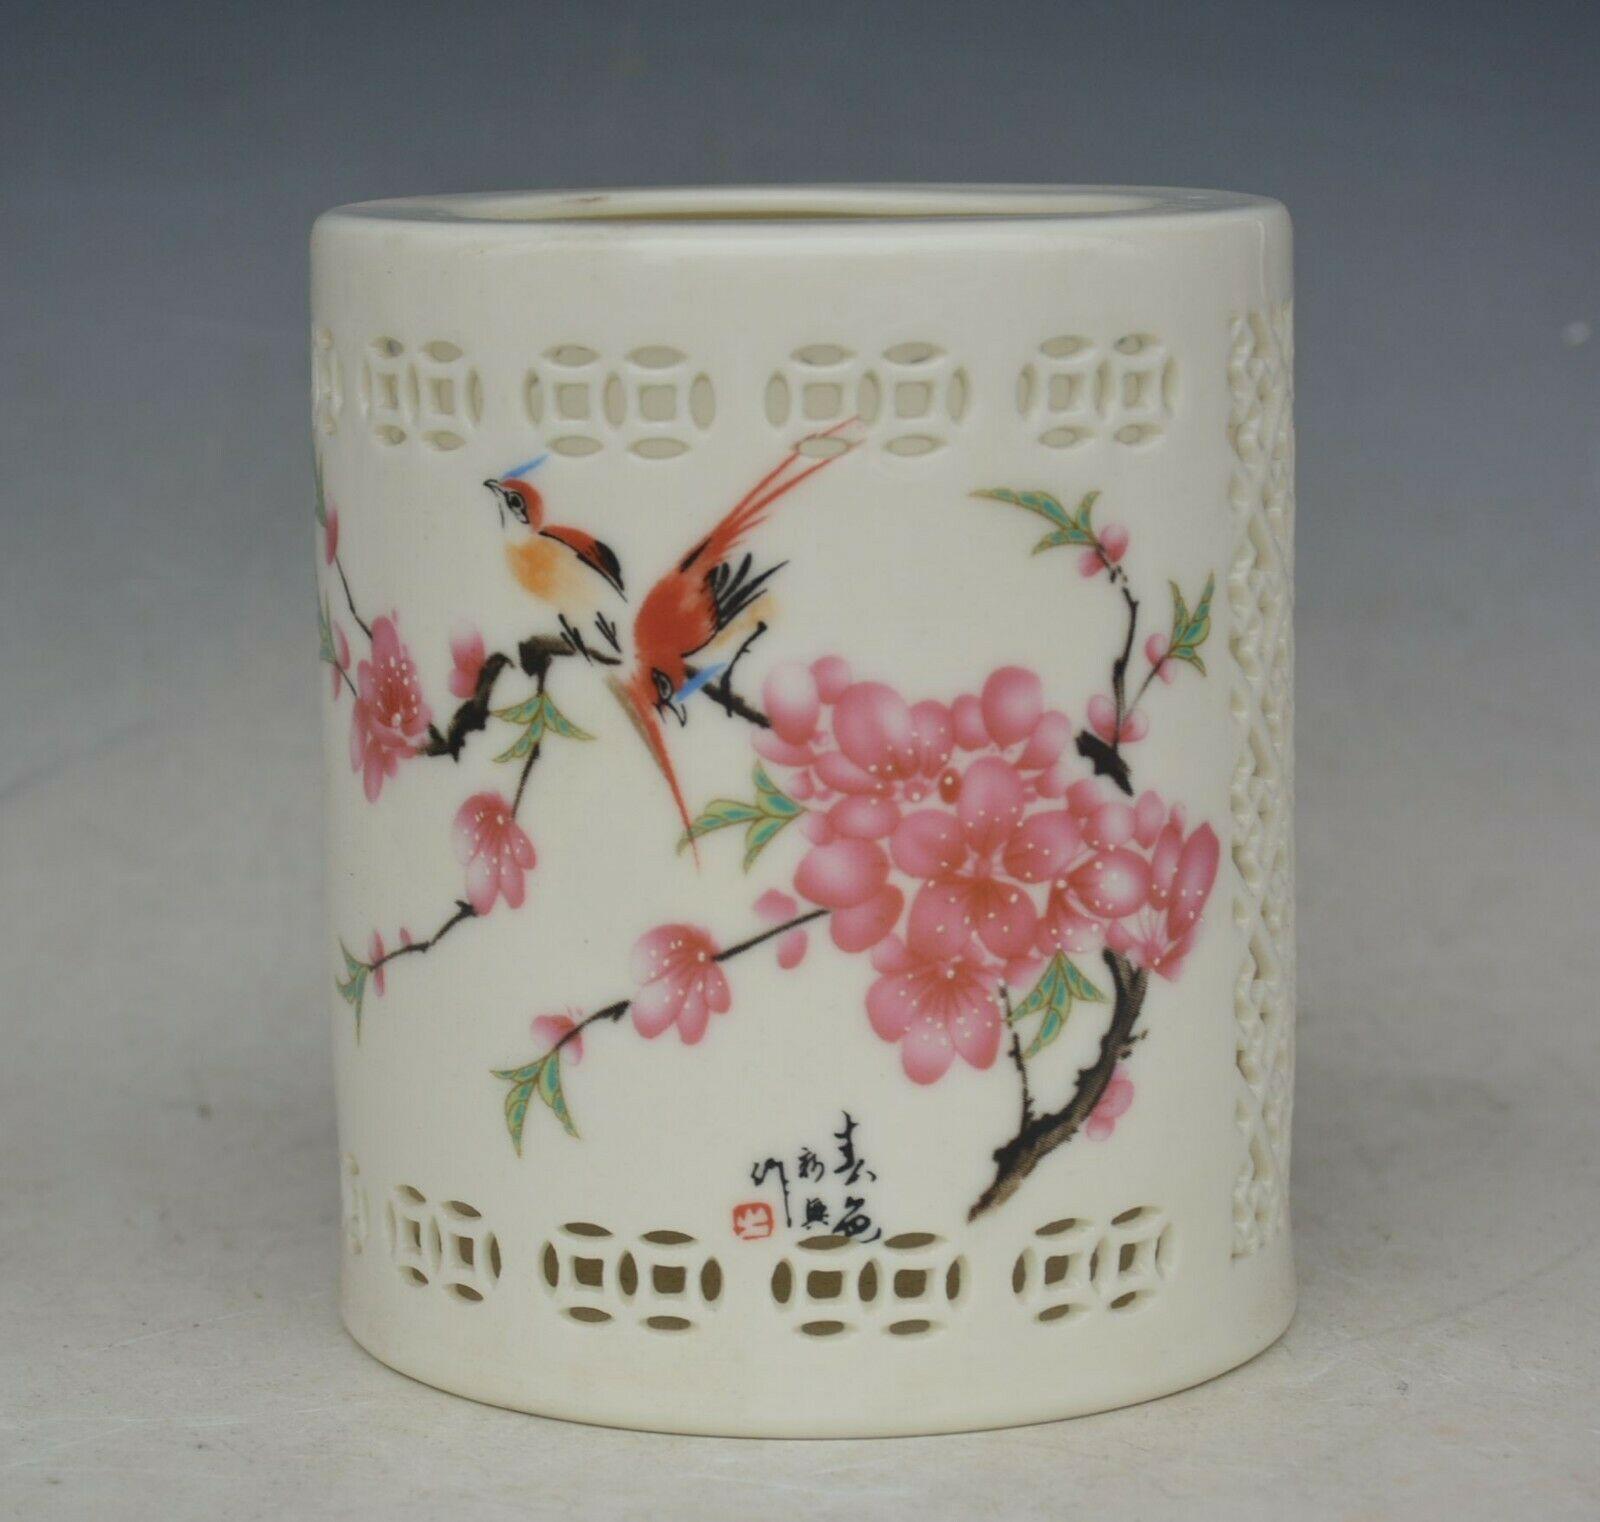 Porcelana china flores y pájaros lápiz florero olla